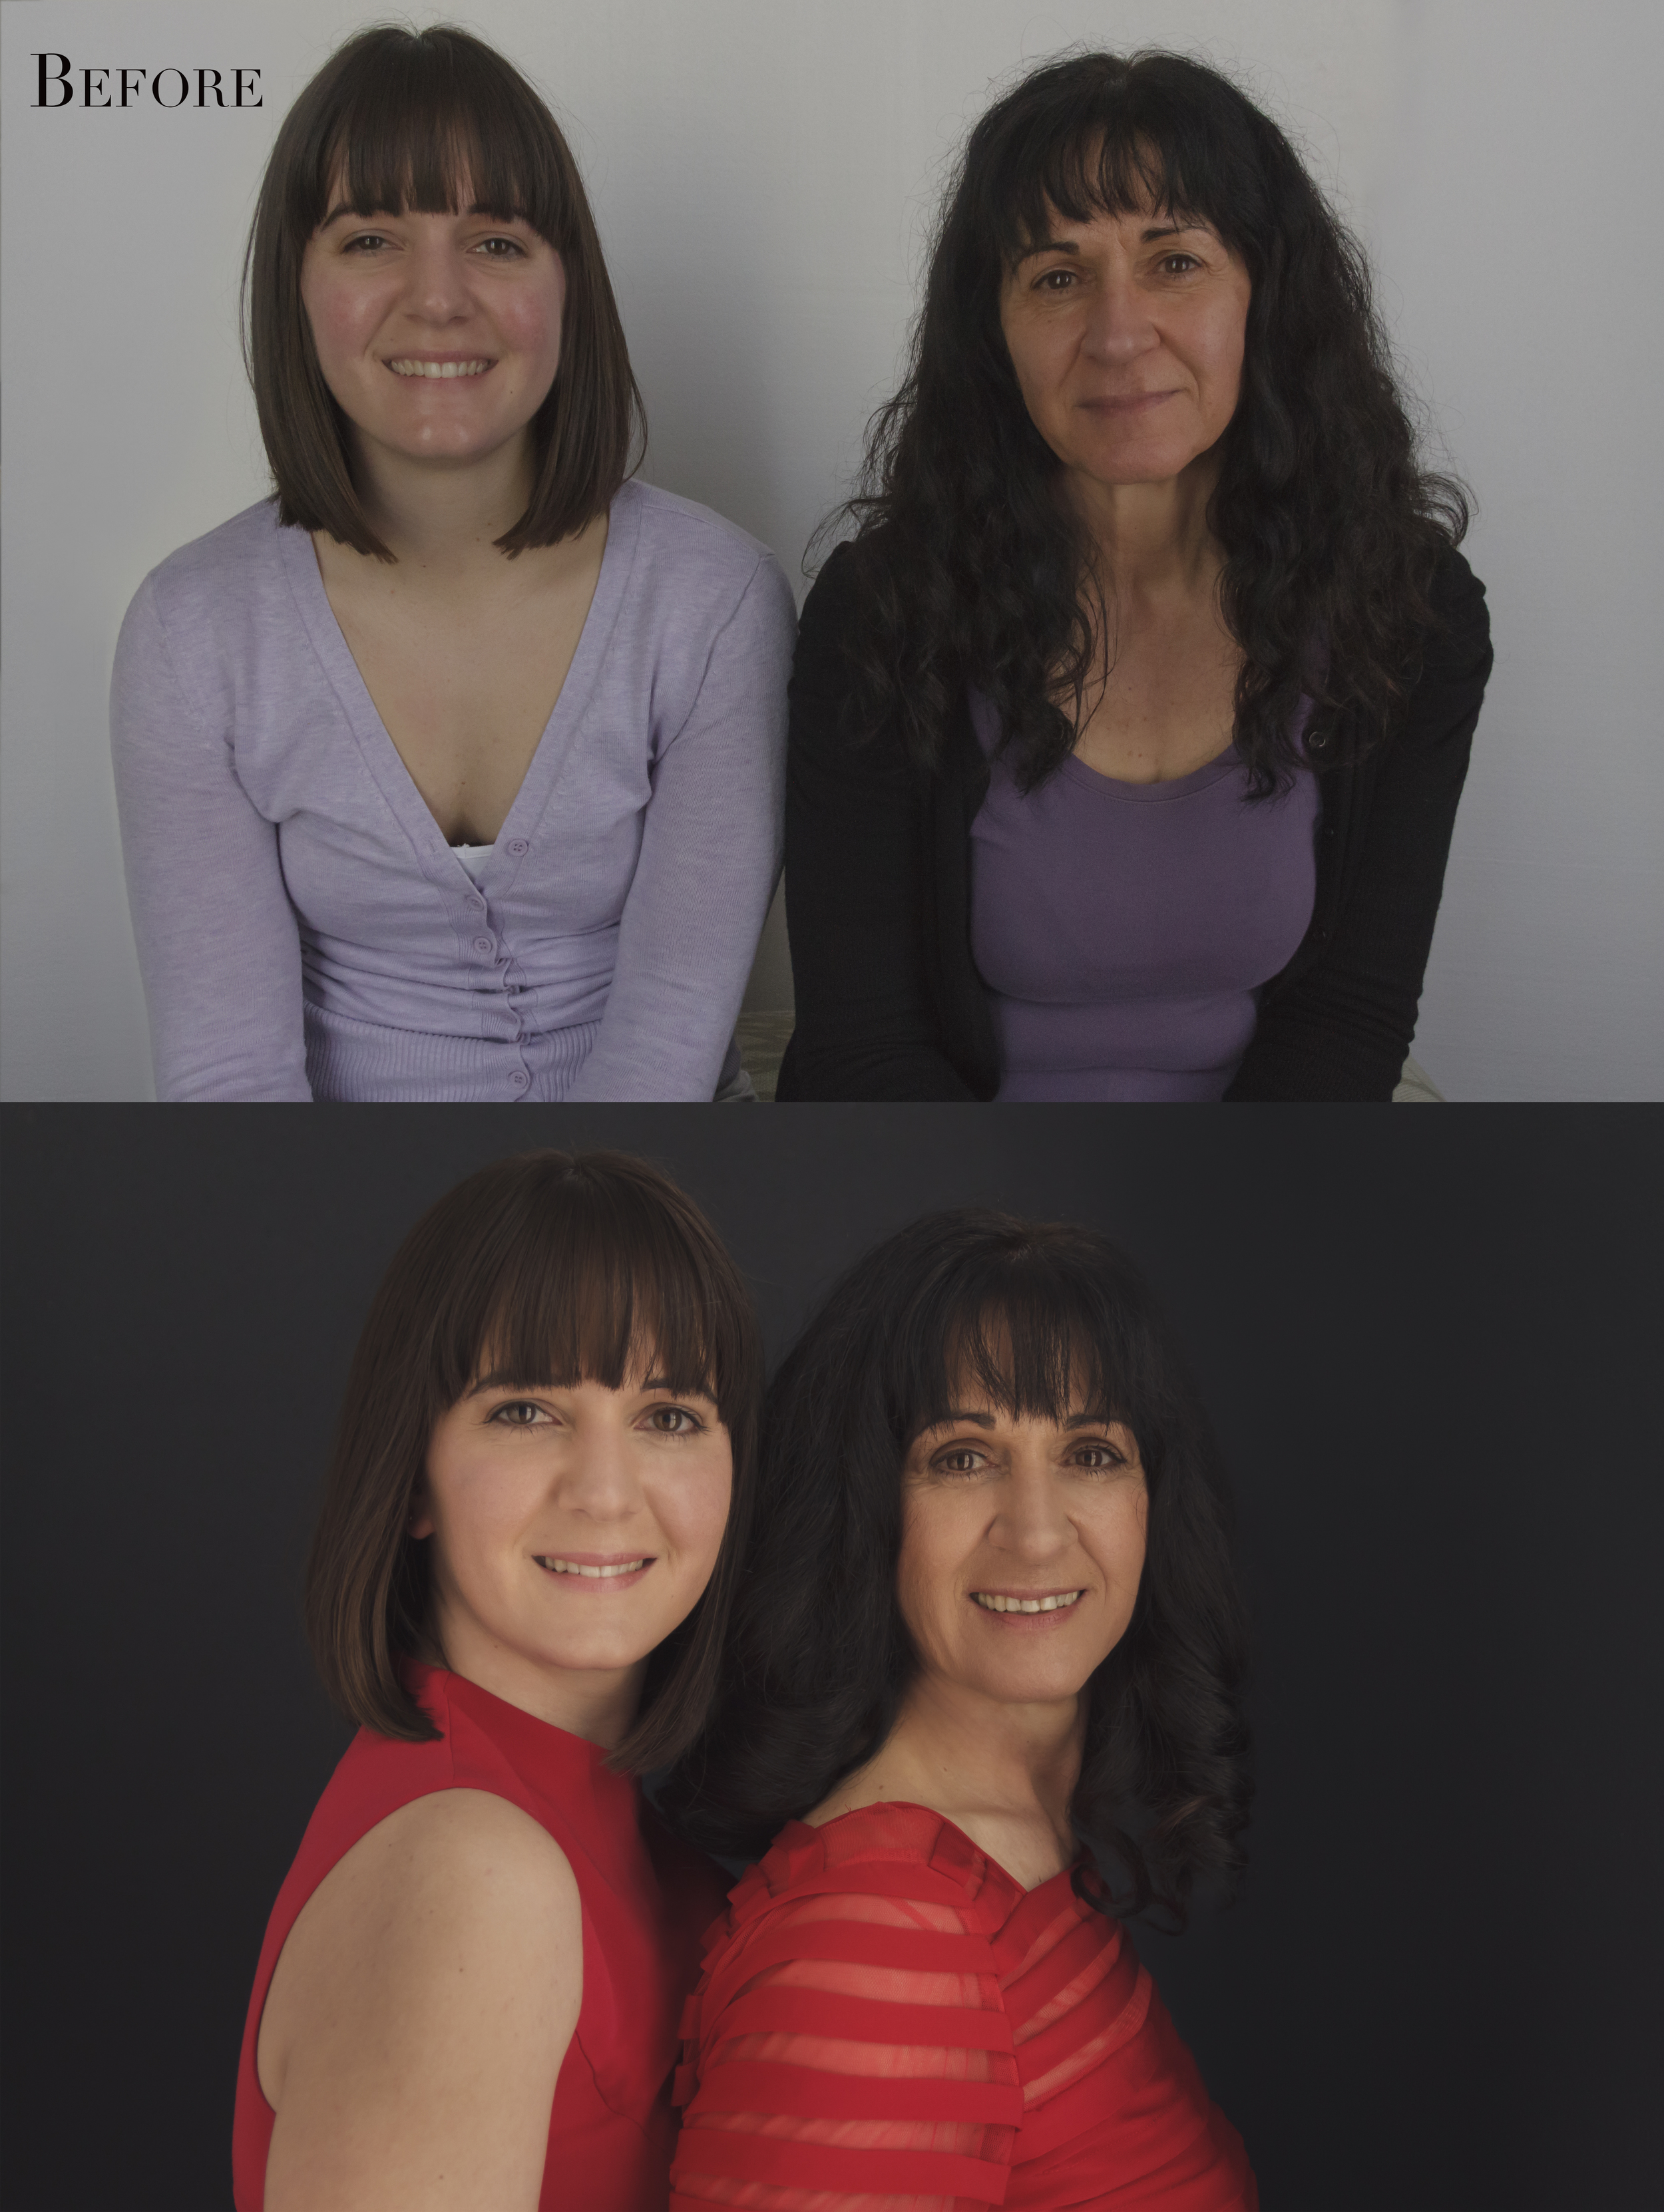 sarahlee-studio-cebalo-mum-daughter